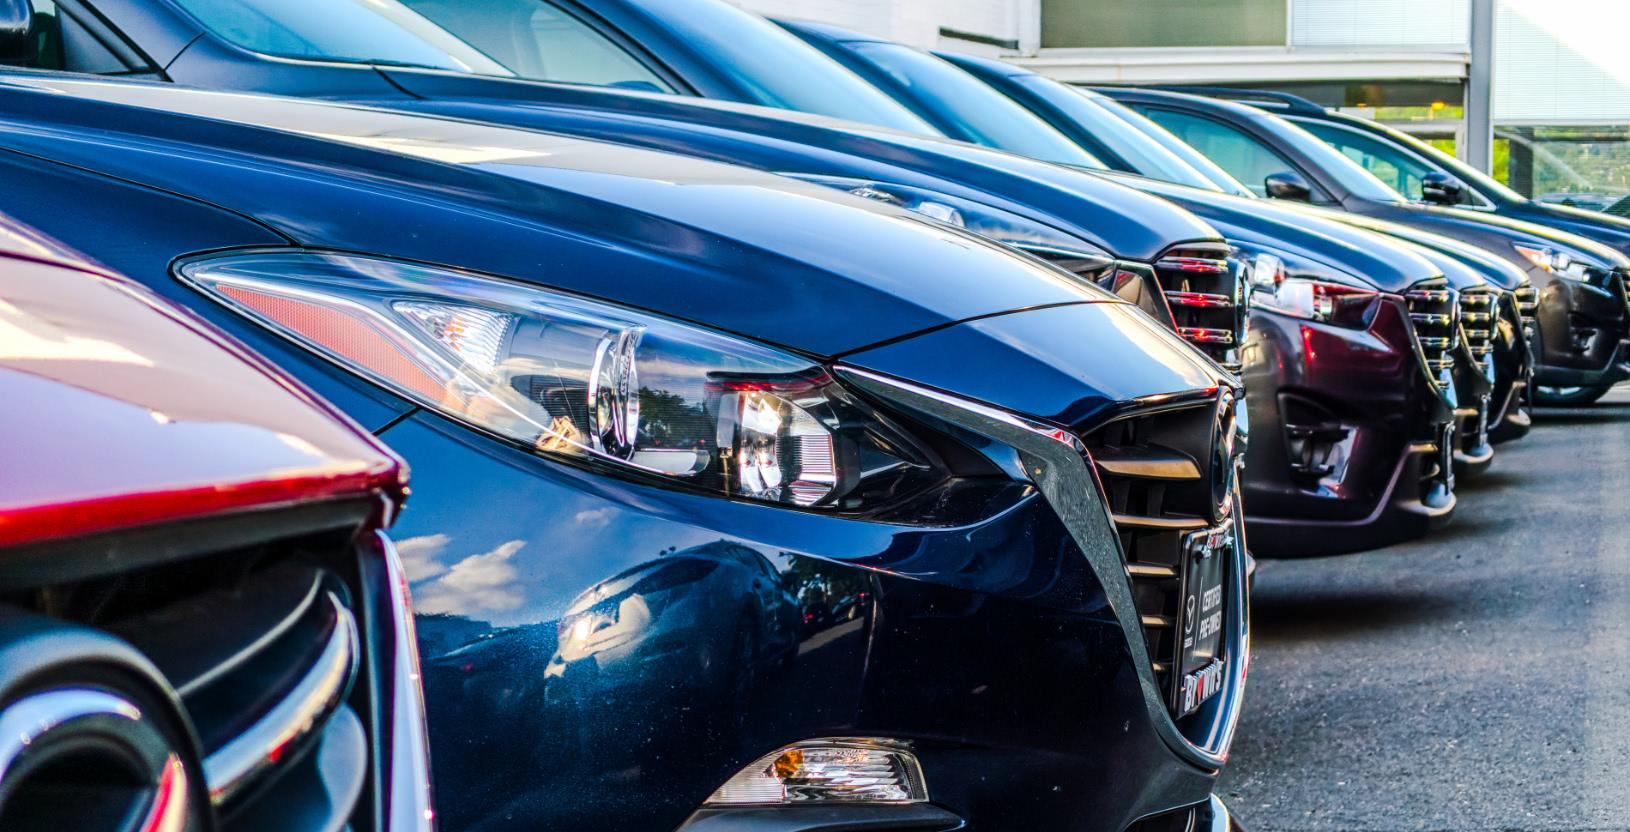 A fleet of parked cars